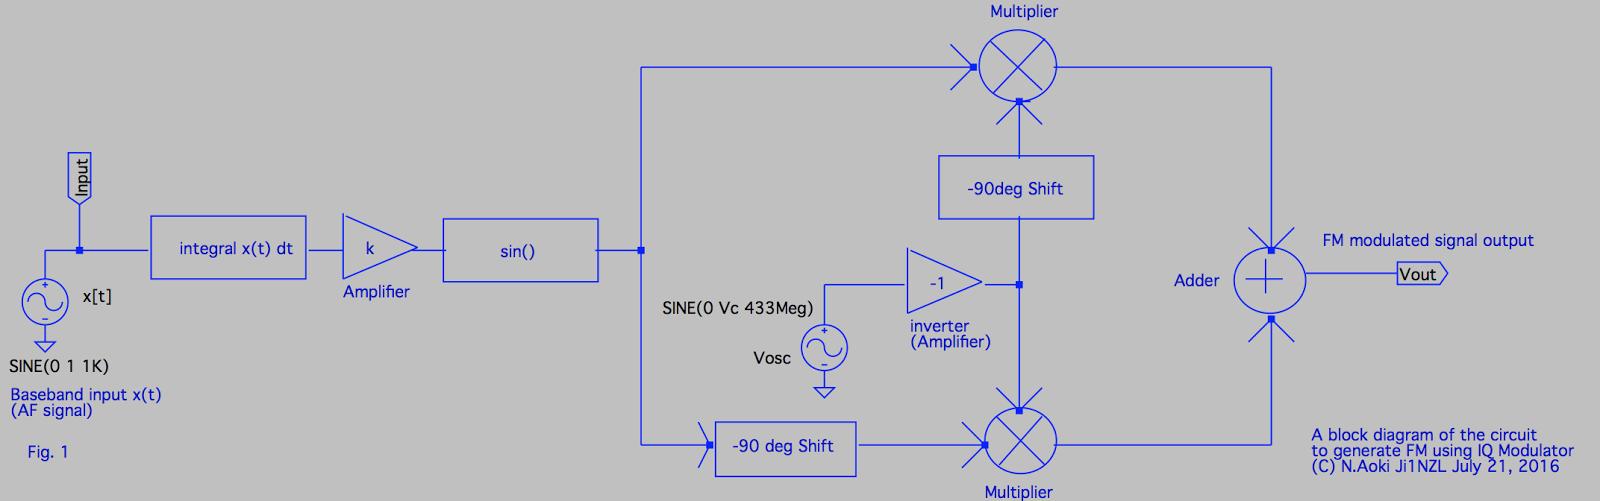 medium resolution of fm modulator used an iq modulator